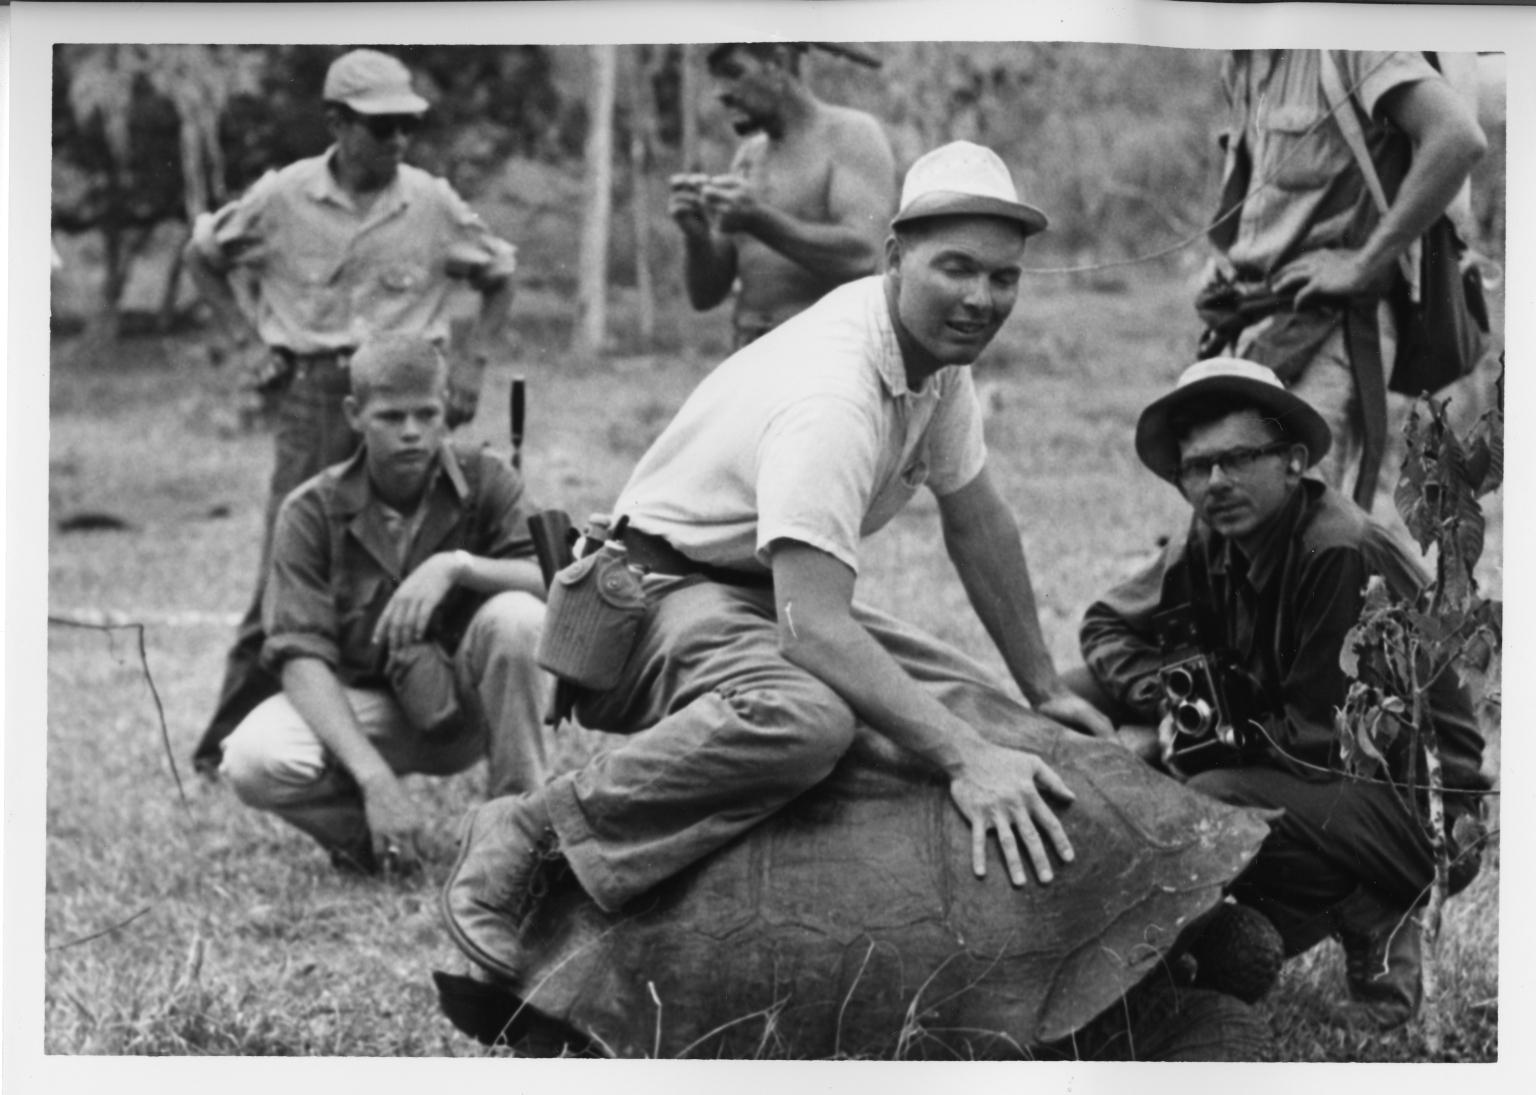 Fieldwork Historical